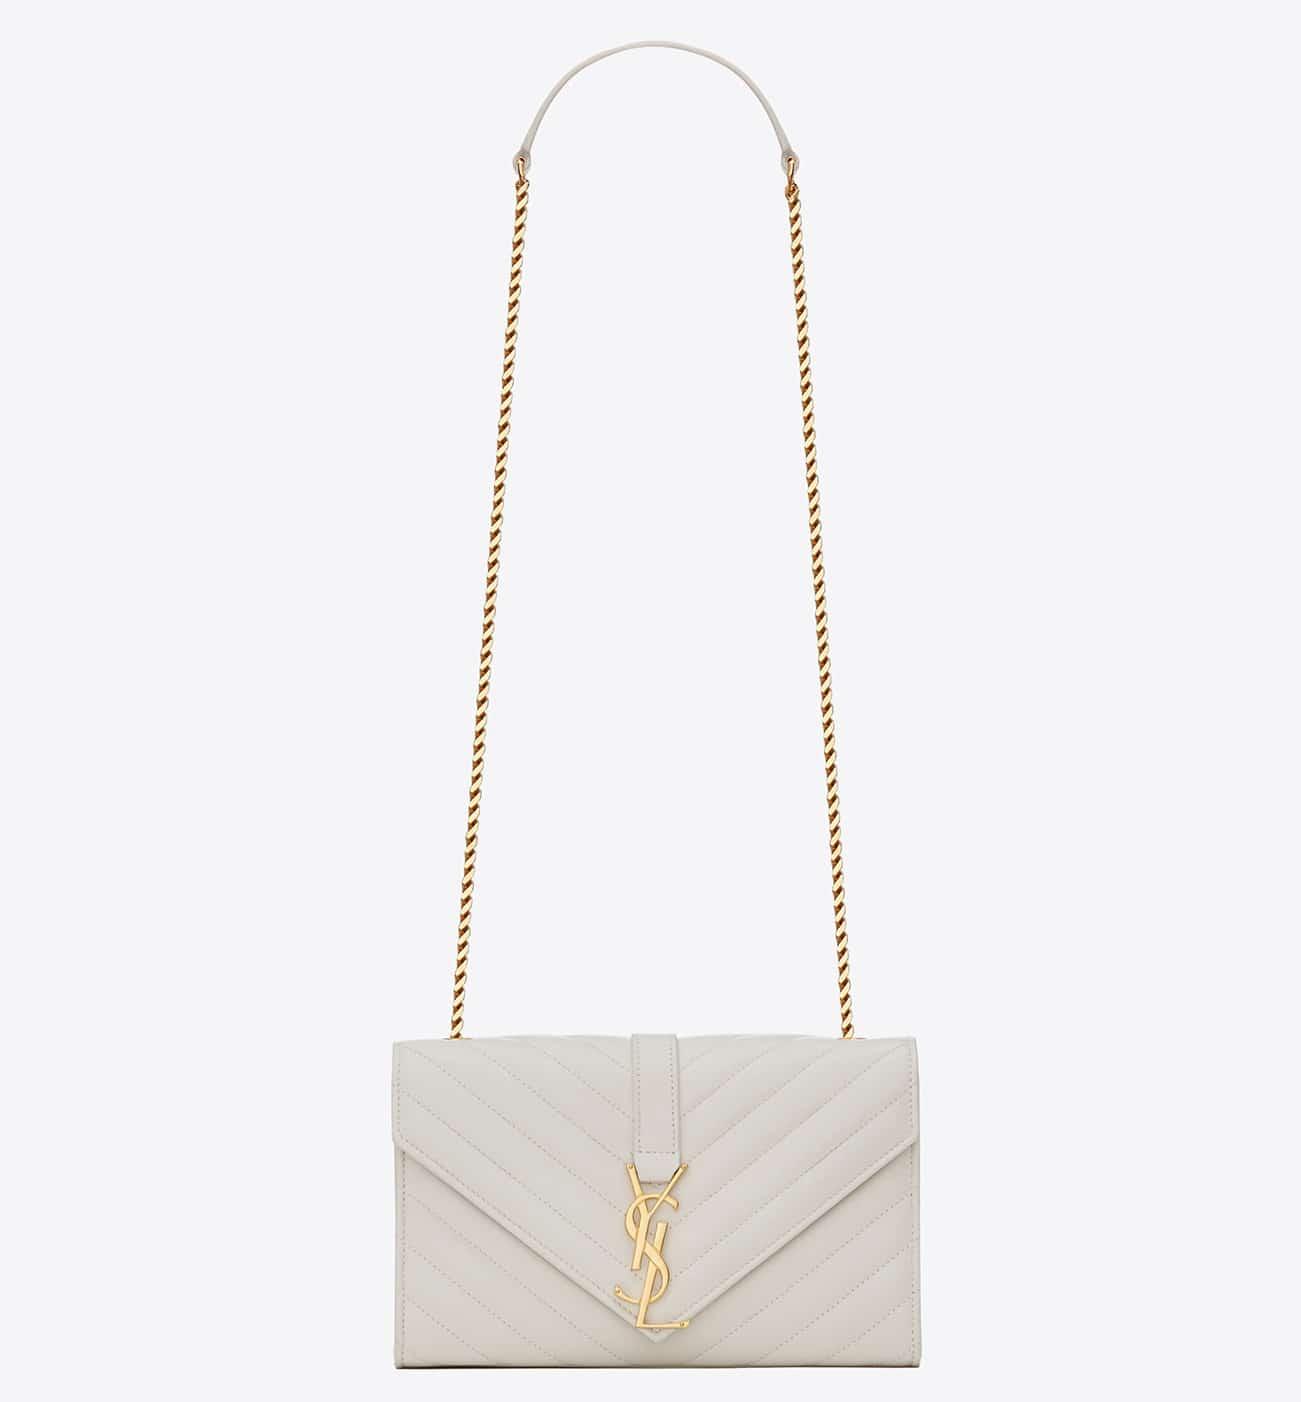 Saint Laurent Monogram Matelassé Flap Bag Reference Guide ...